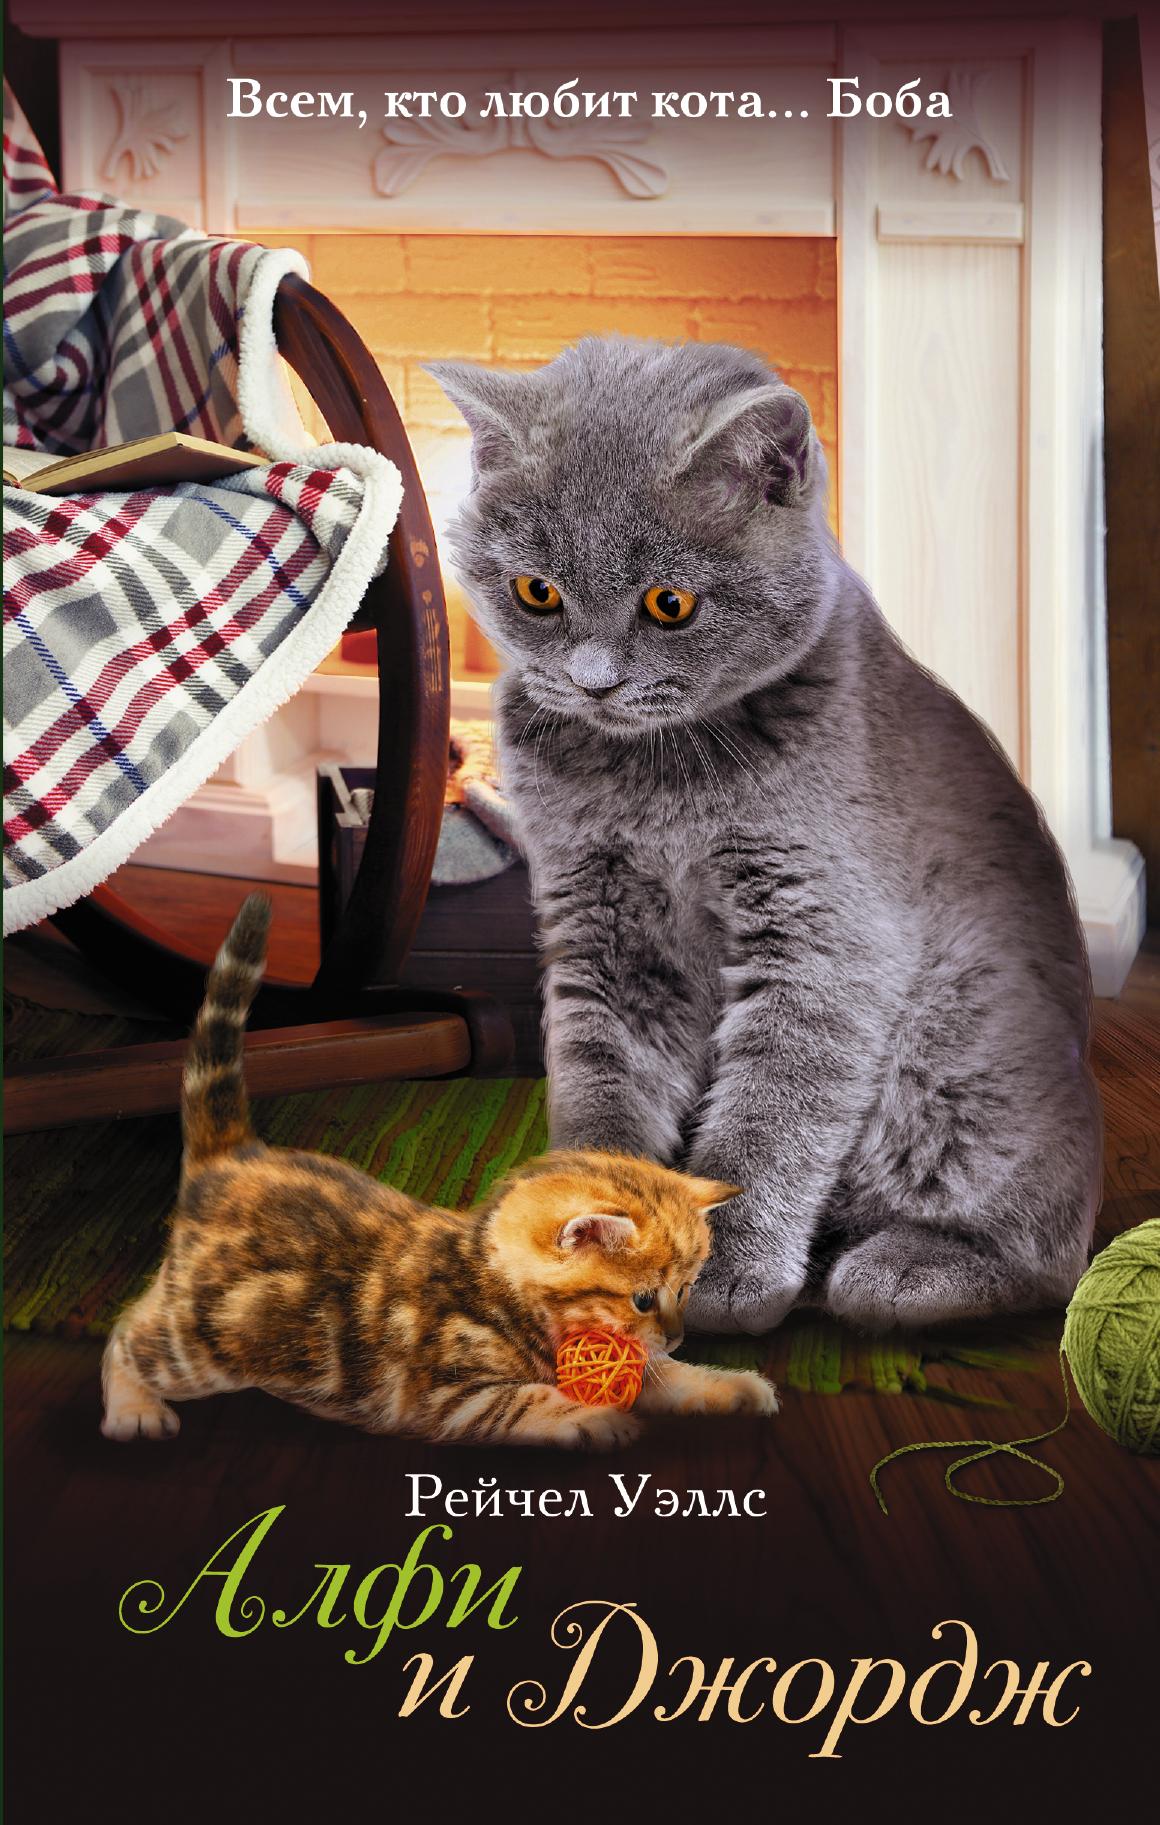 Уэллс Рейчел Алфи и Джордж ISBN: 978-5-17-103651-5 уэллс р кот по имени алфи